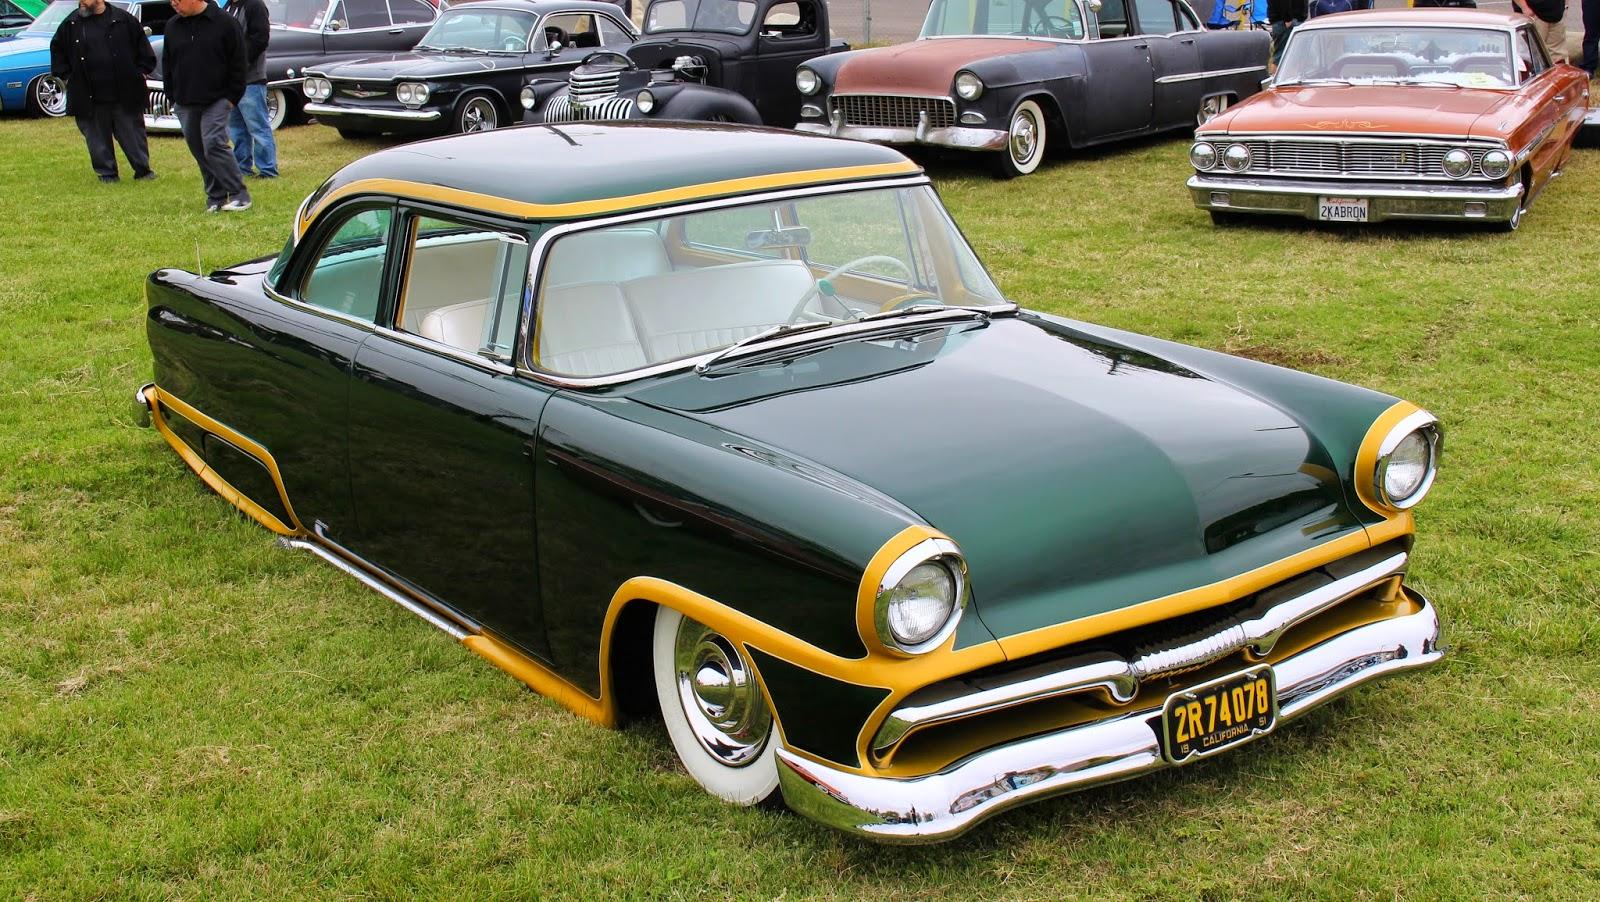 covering classic cars 2015 west coast kustoms cruisin 39 nationals in santa maria. Black Bedroom Furniture Sets. Home Design Ideas